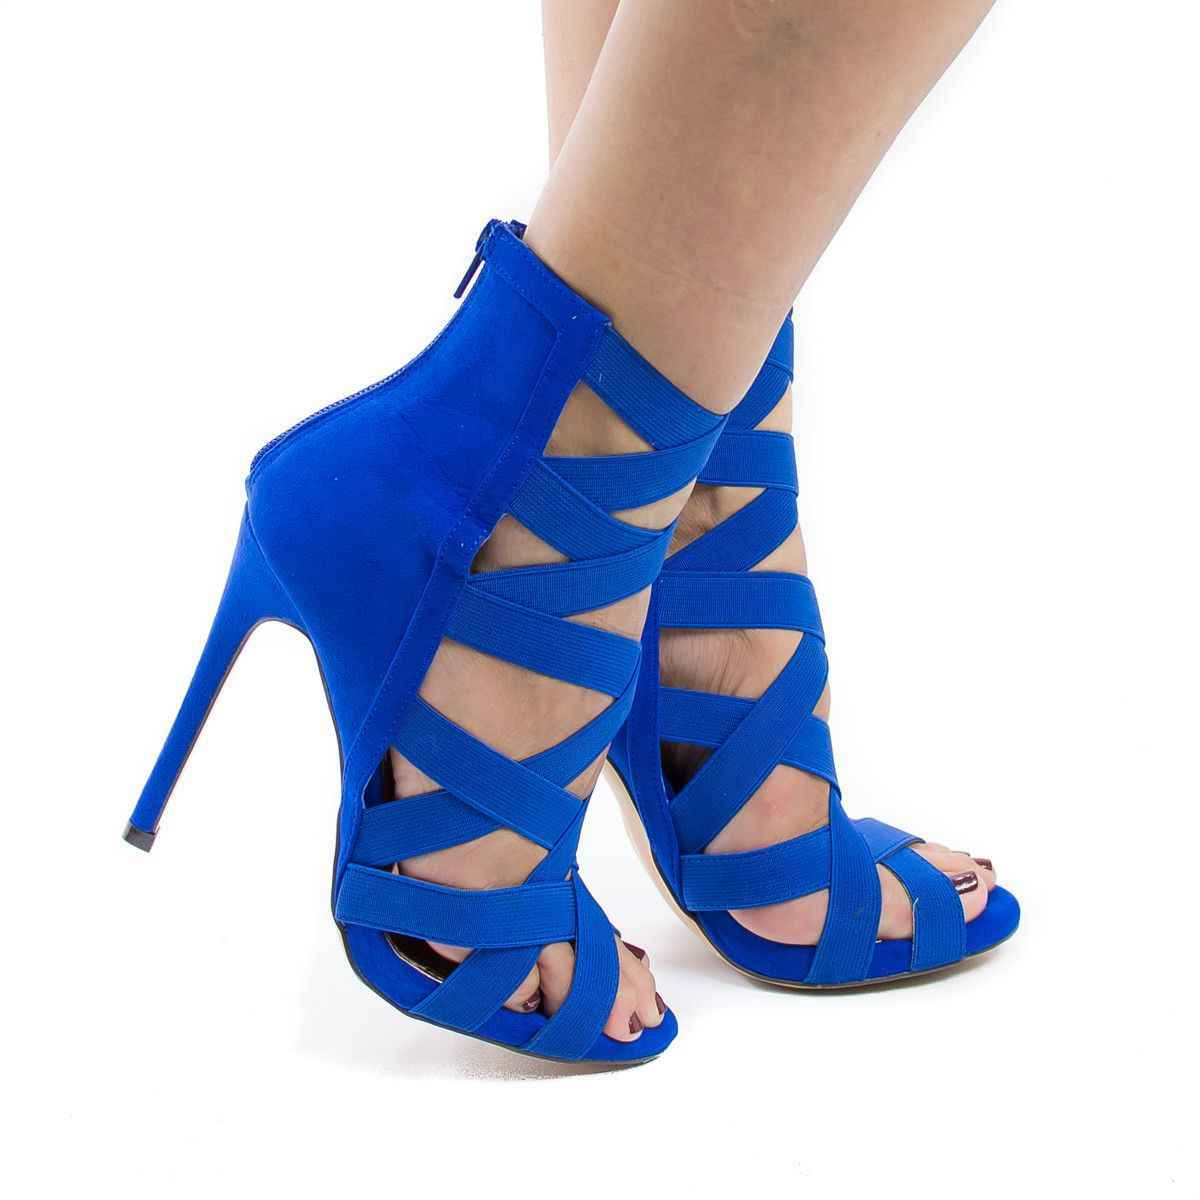 Sexy Blau Schwarz Cross Strap Frauen Sandalen Cut-out Peep Toe Stretch Stoff Gladiator Sandalen Frauen Zurück Zipper Käfig schuhe